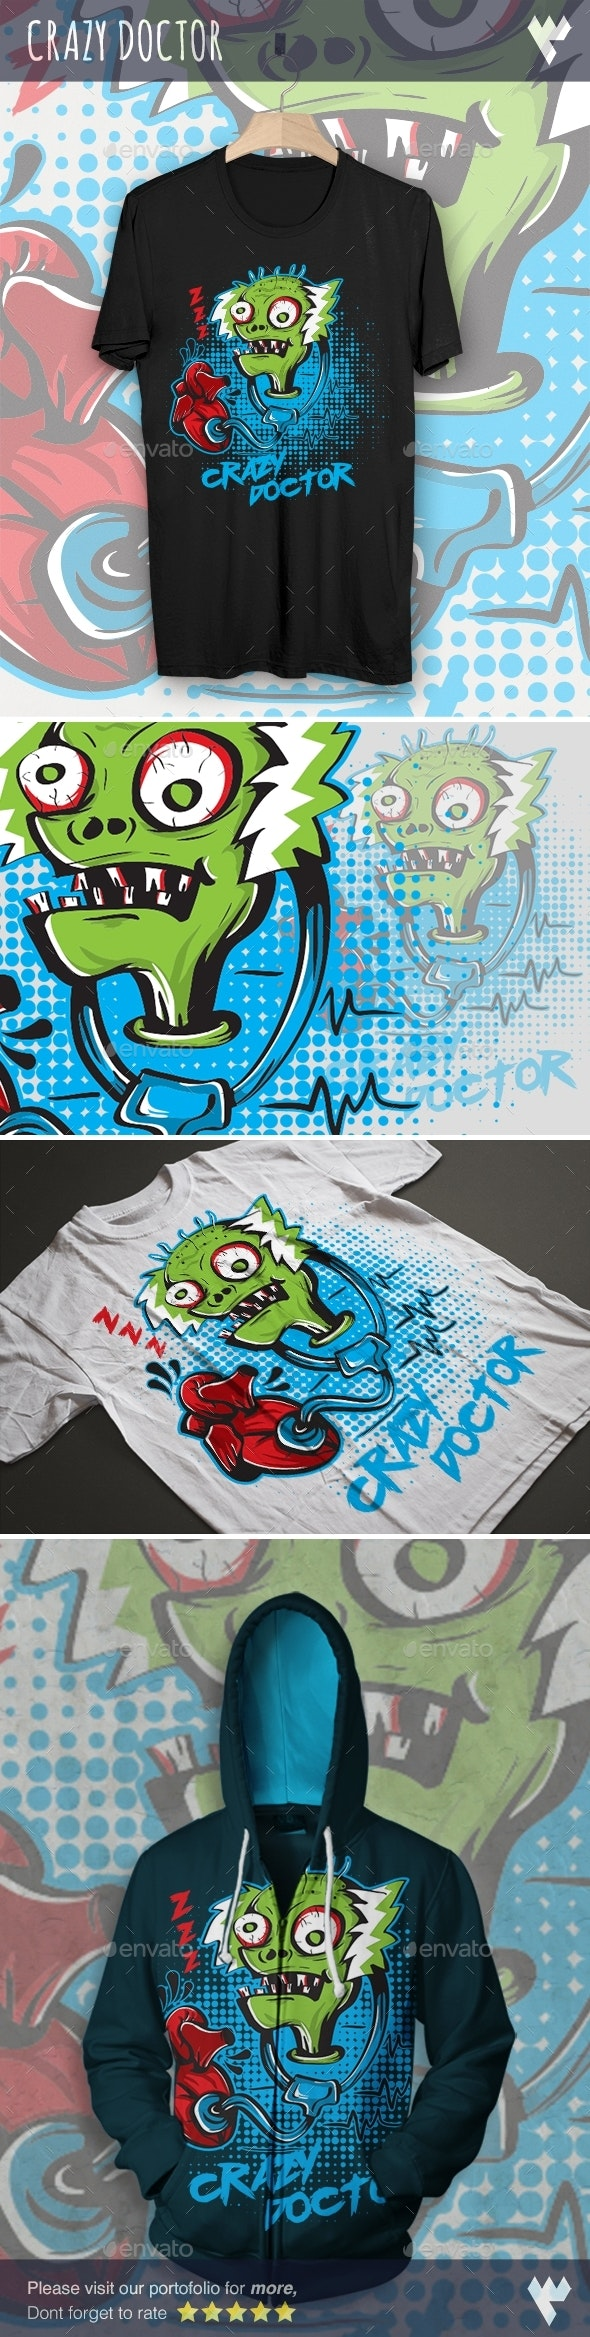 Crazy Doctor Zombie - Funny Designs